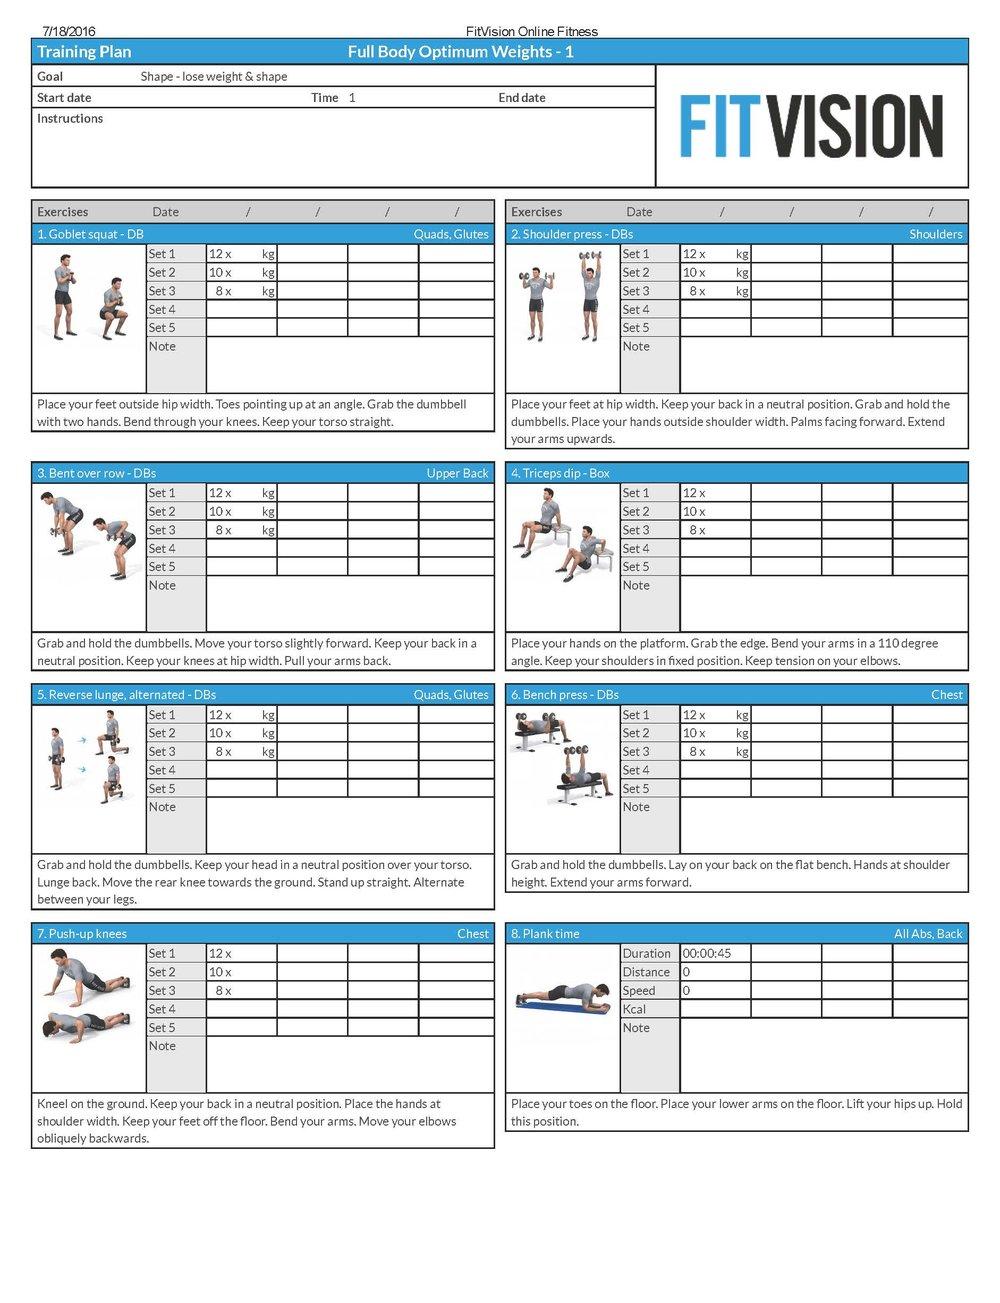 Optimum Full Body Workout